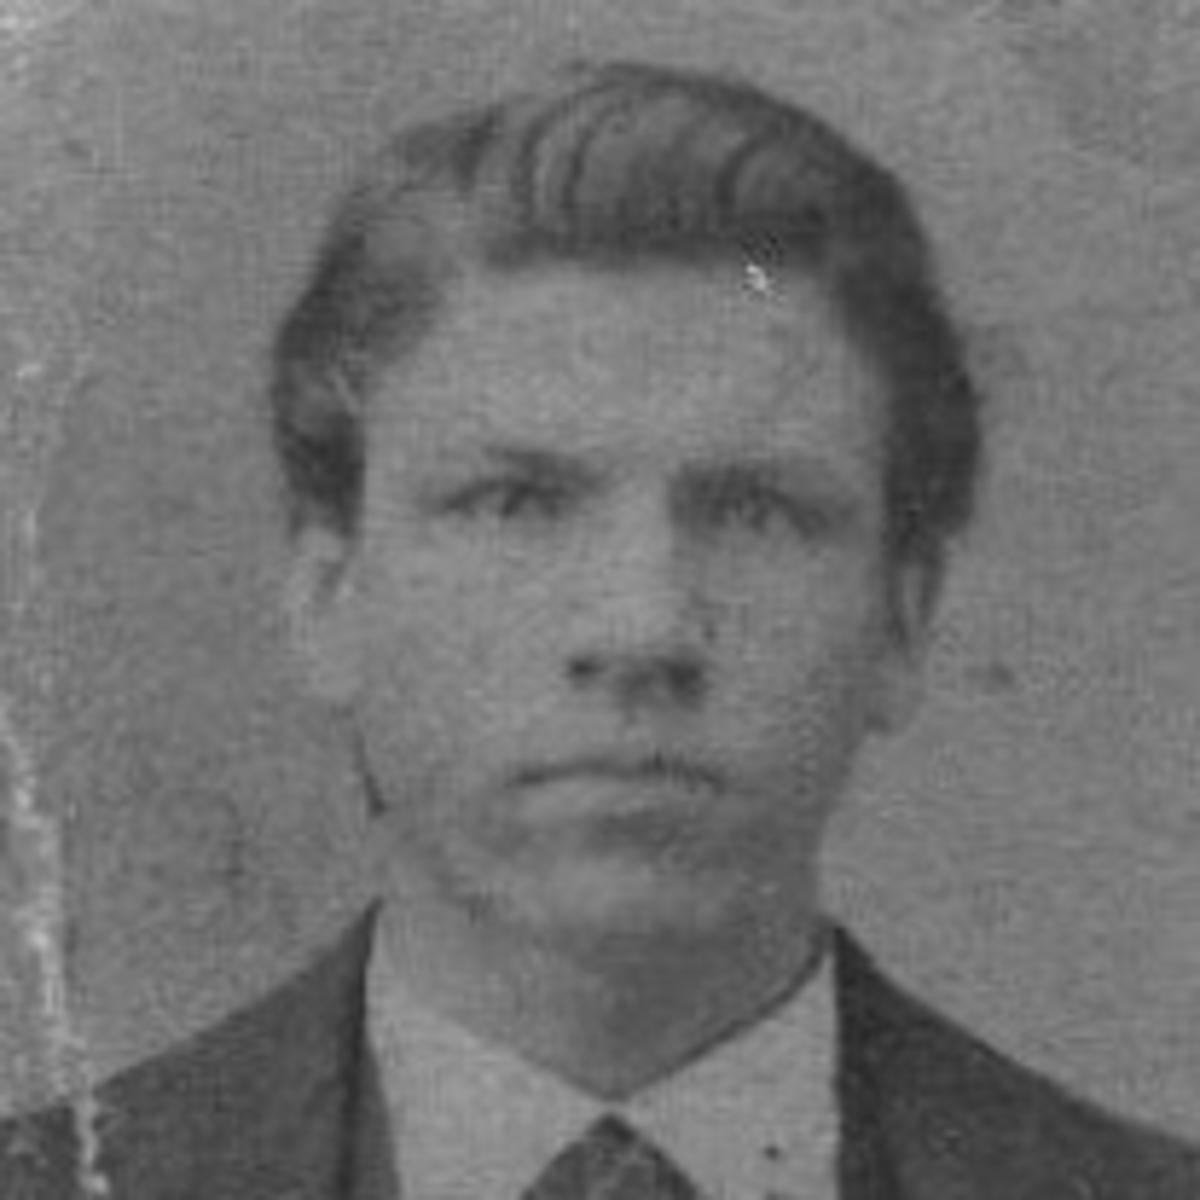 Joseph Hyrum Parry